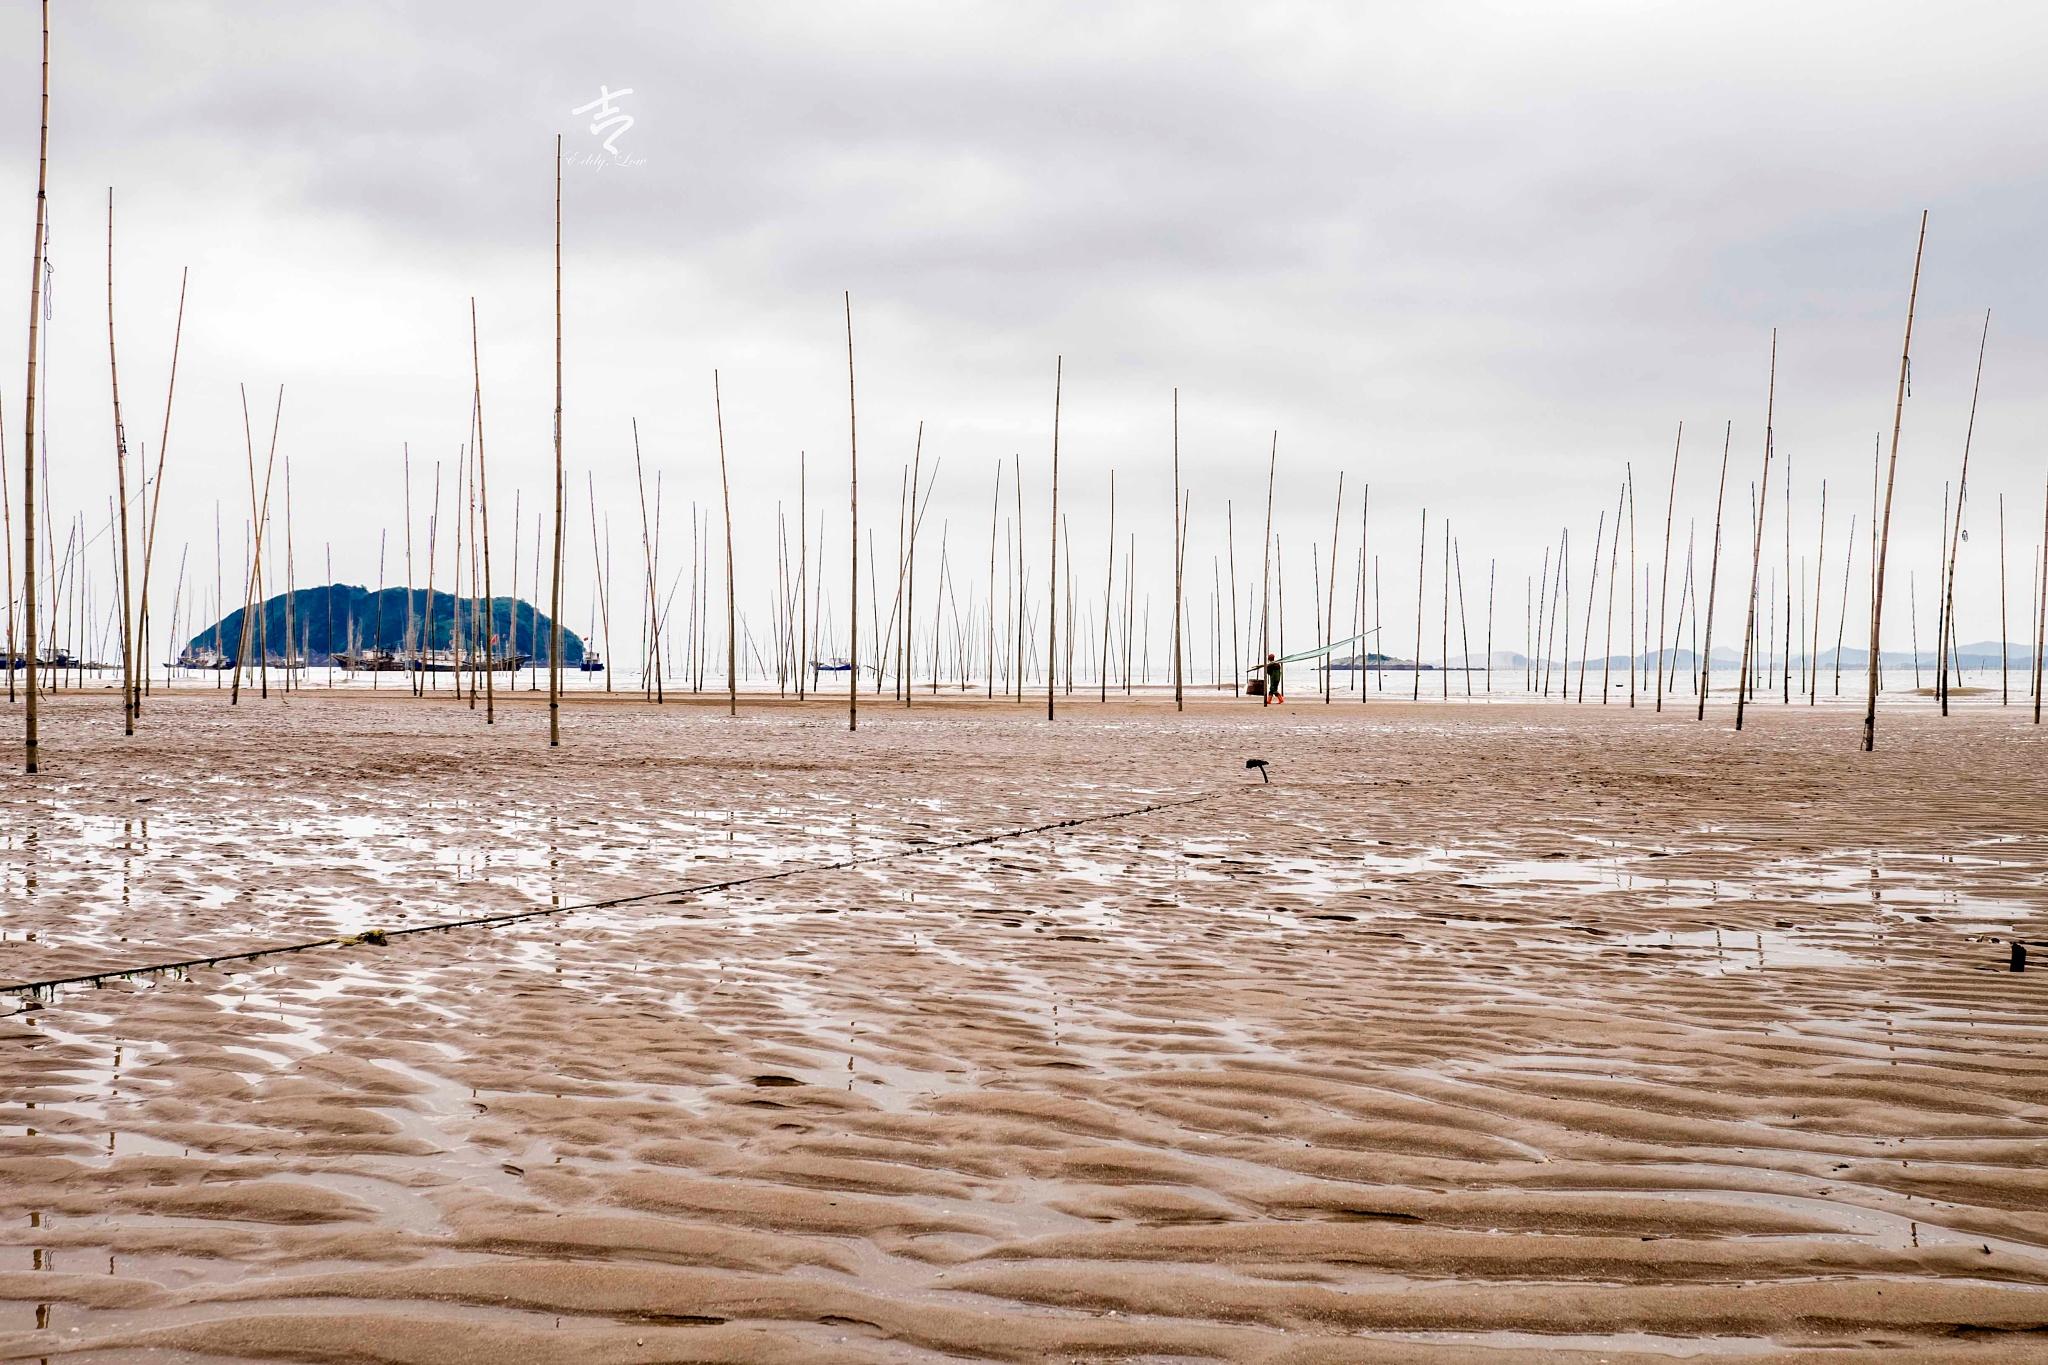 Pattern of the beach. by eddylowck